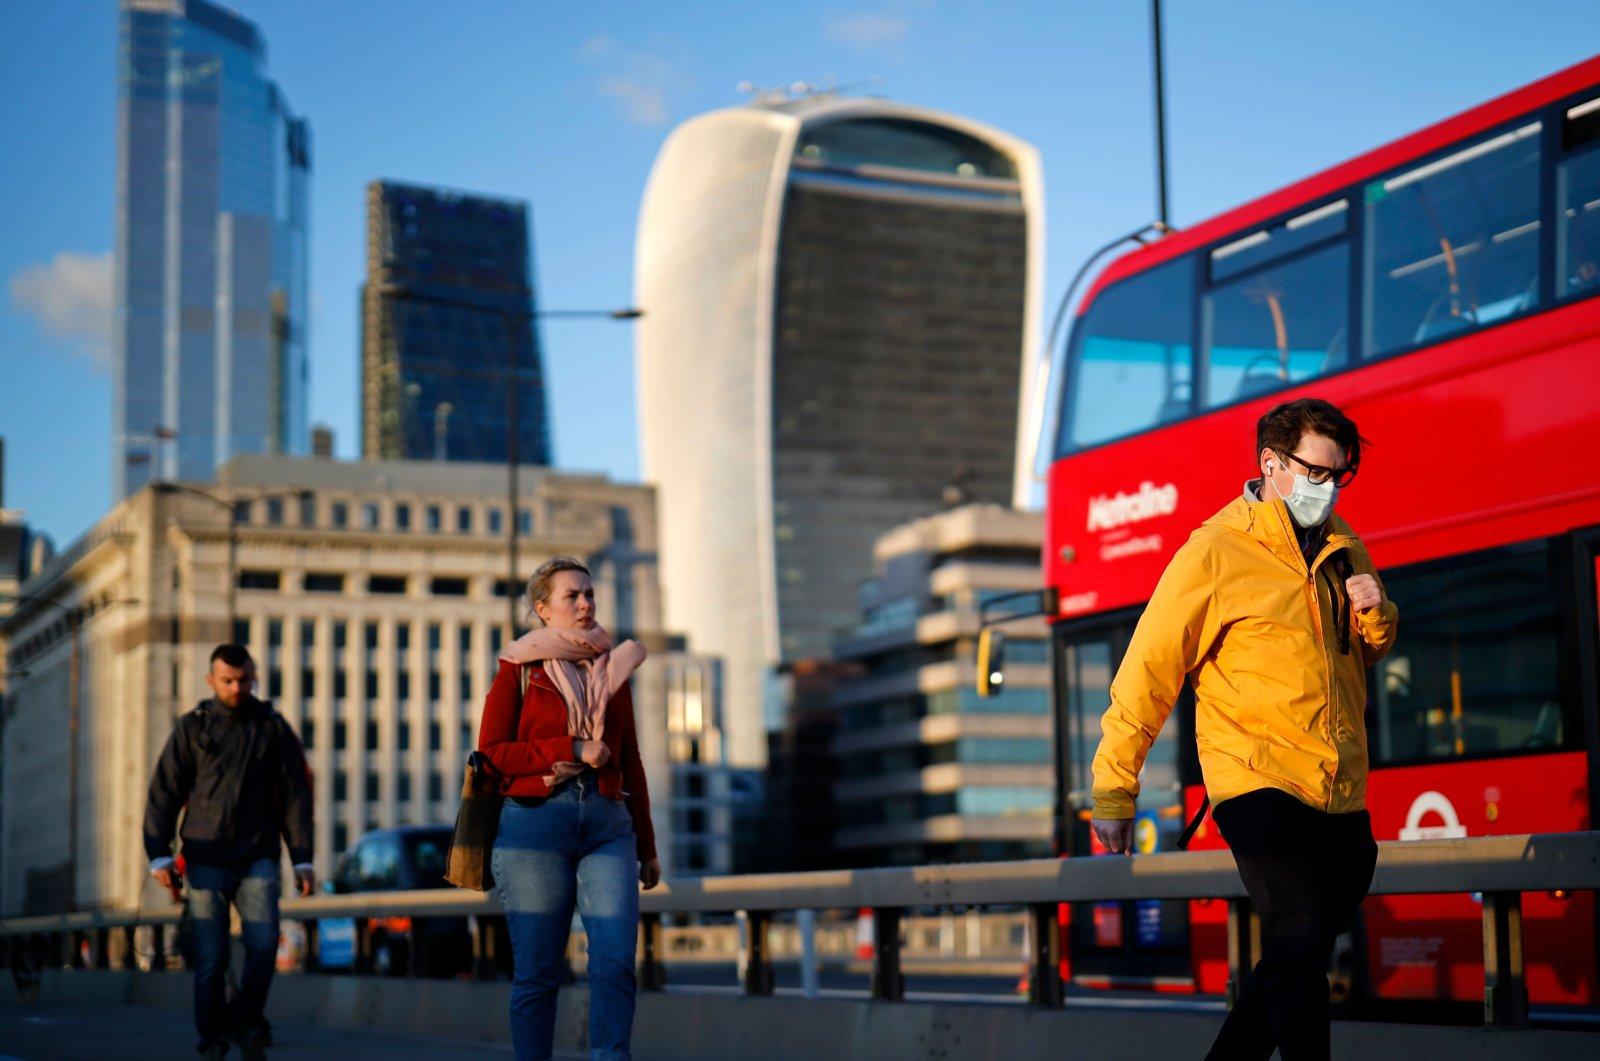 People cross London Bridge in the evening sunshine, in London, Sept. 25, 2020. (AFP Photo)